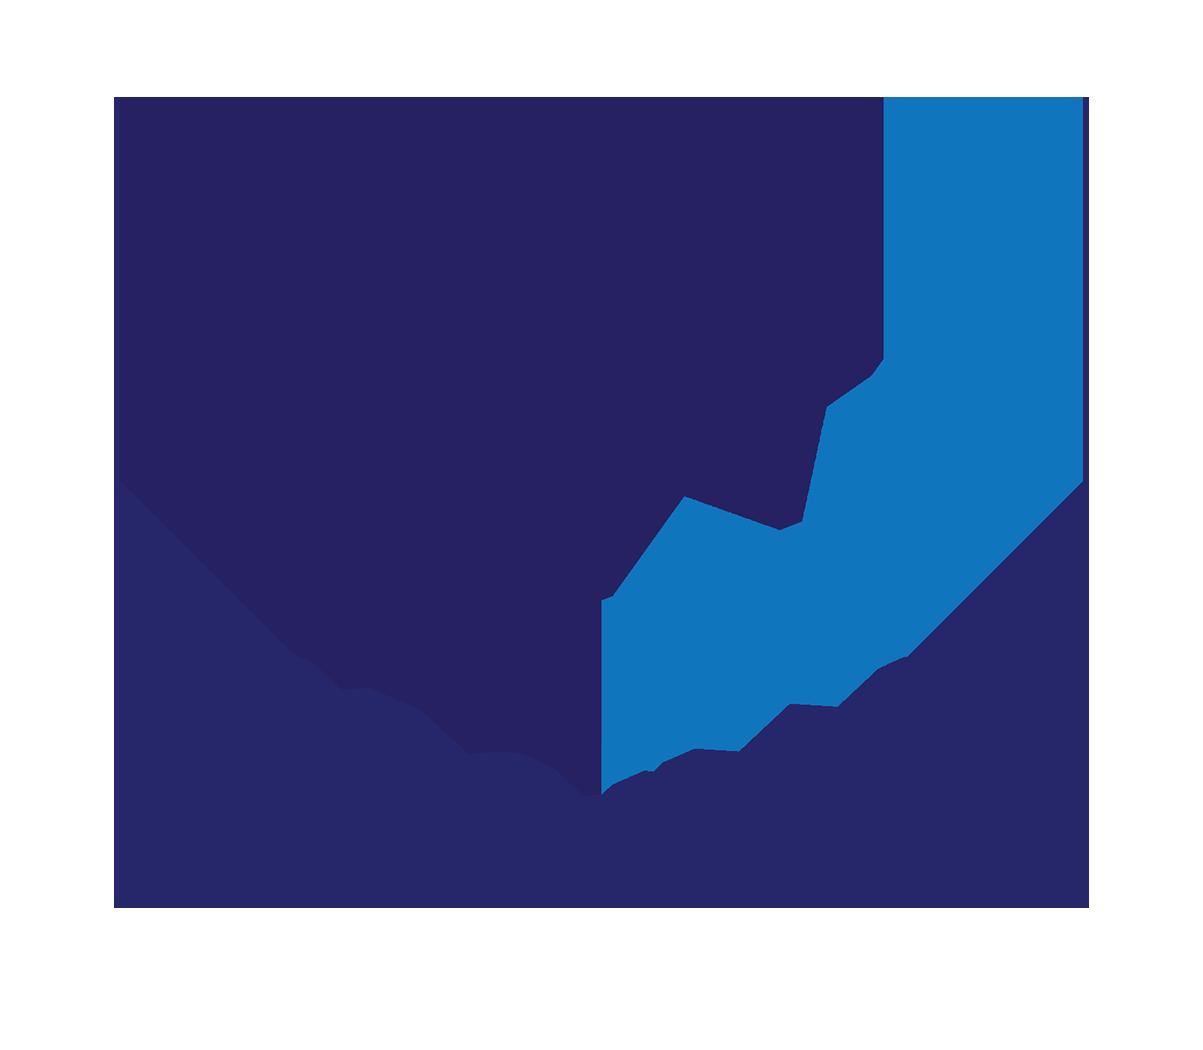 merchantIm.png